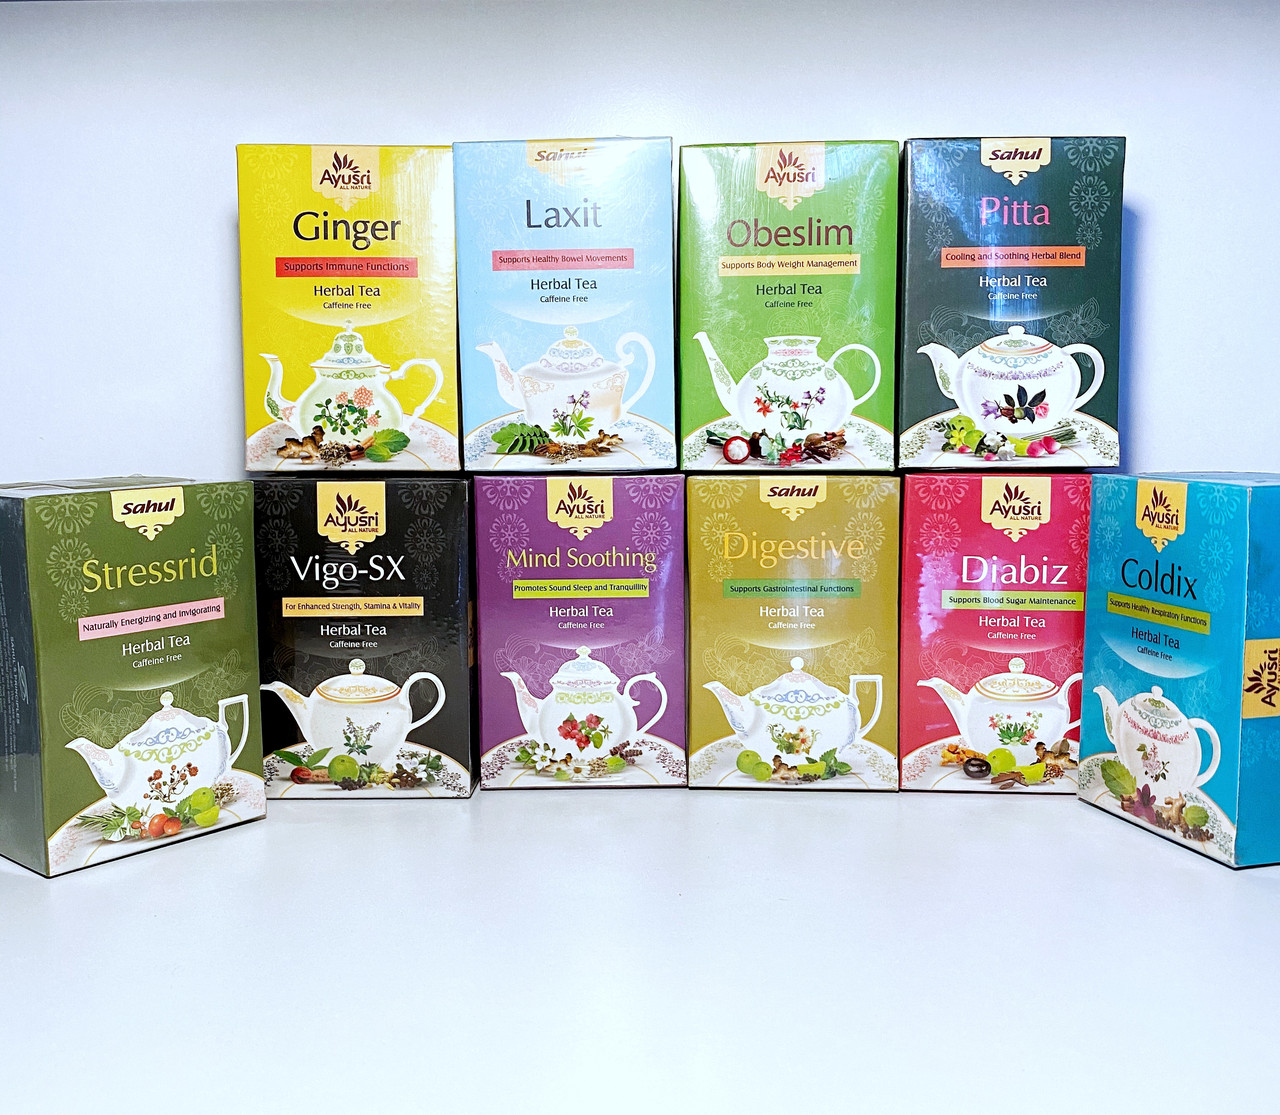 Аюрведический чай Виго Секс для половой активности, Vigo- SX Herbal Tea, 400 гр, Ayusri - фото 2